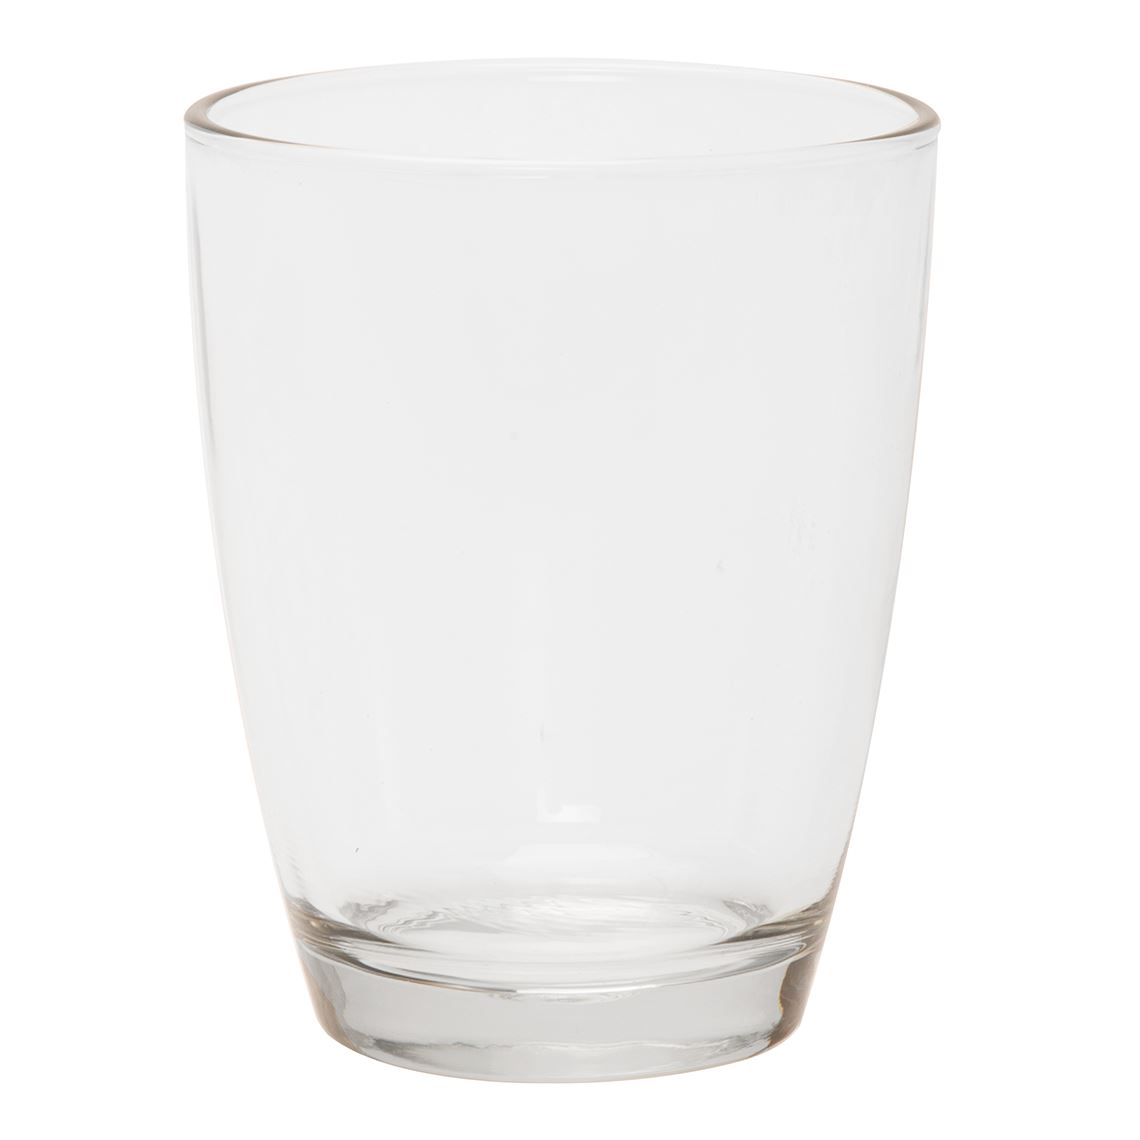 Trevi L Tumbler Size W 9cm x D 9cm x H 11cm Glass Freedom